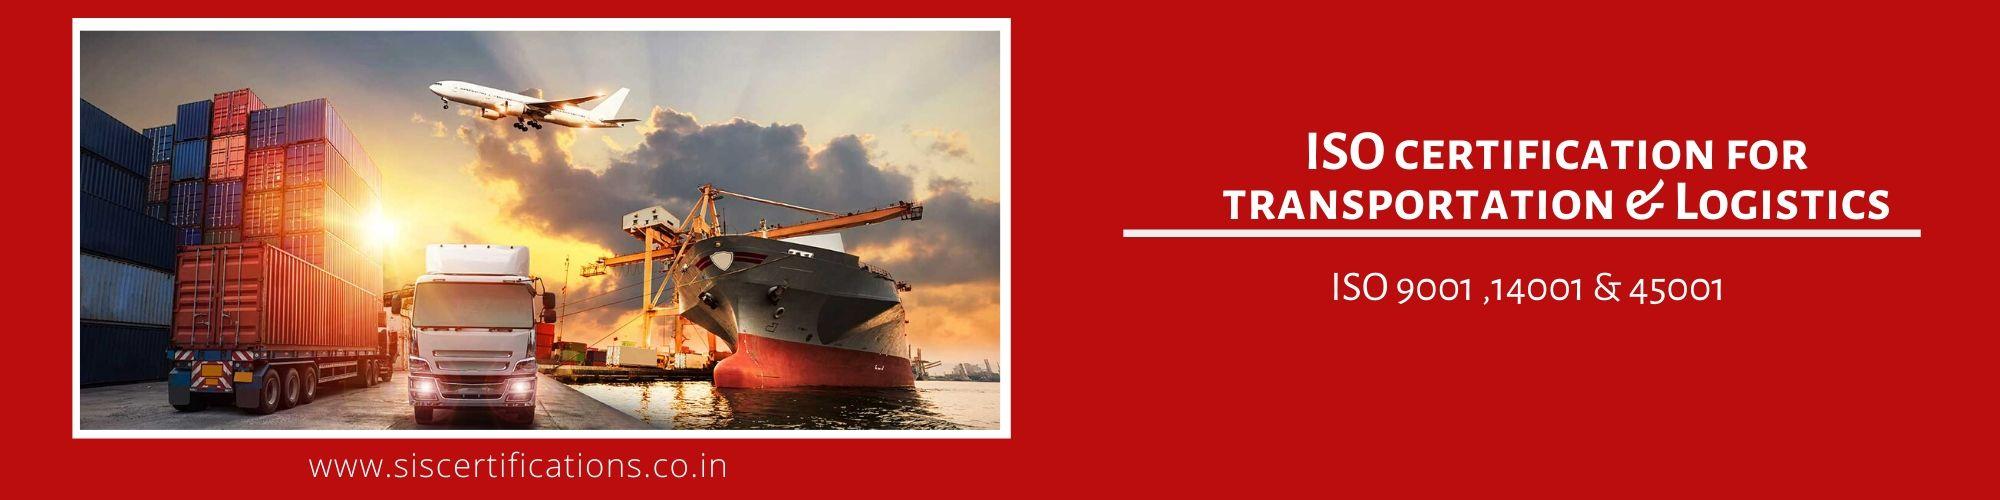 ISO Certification For Transportation & Logistics , ISO Certification For Transportation & Logistics